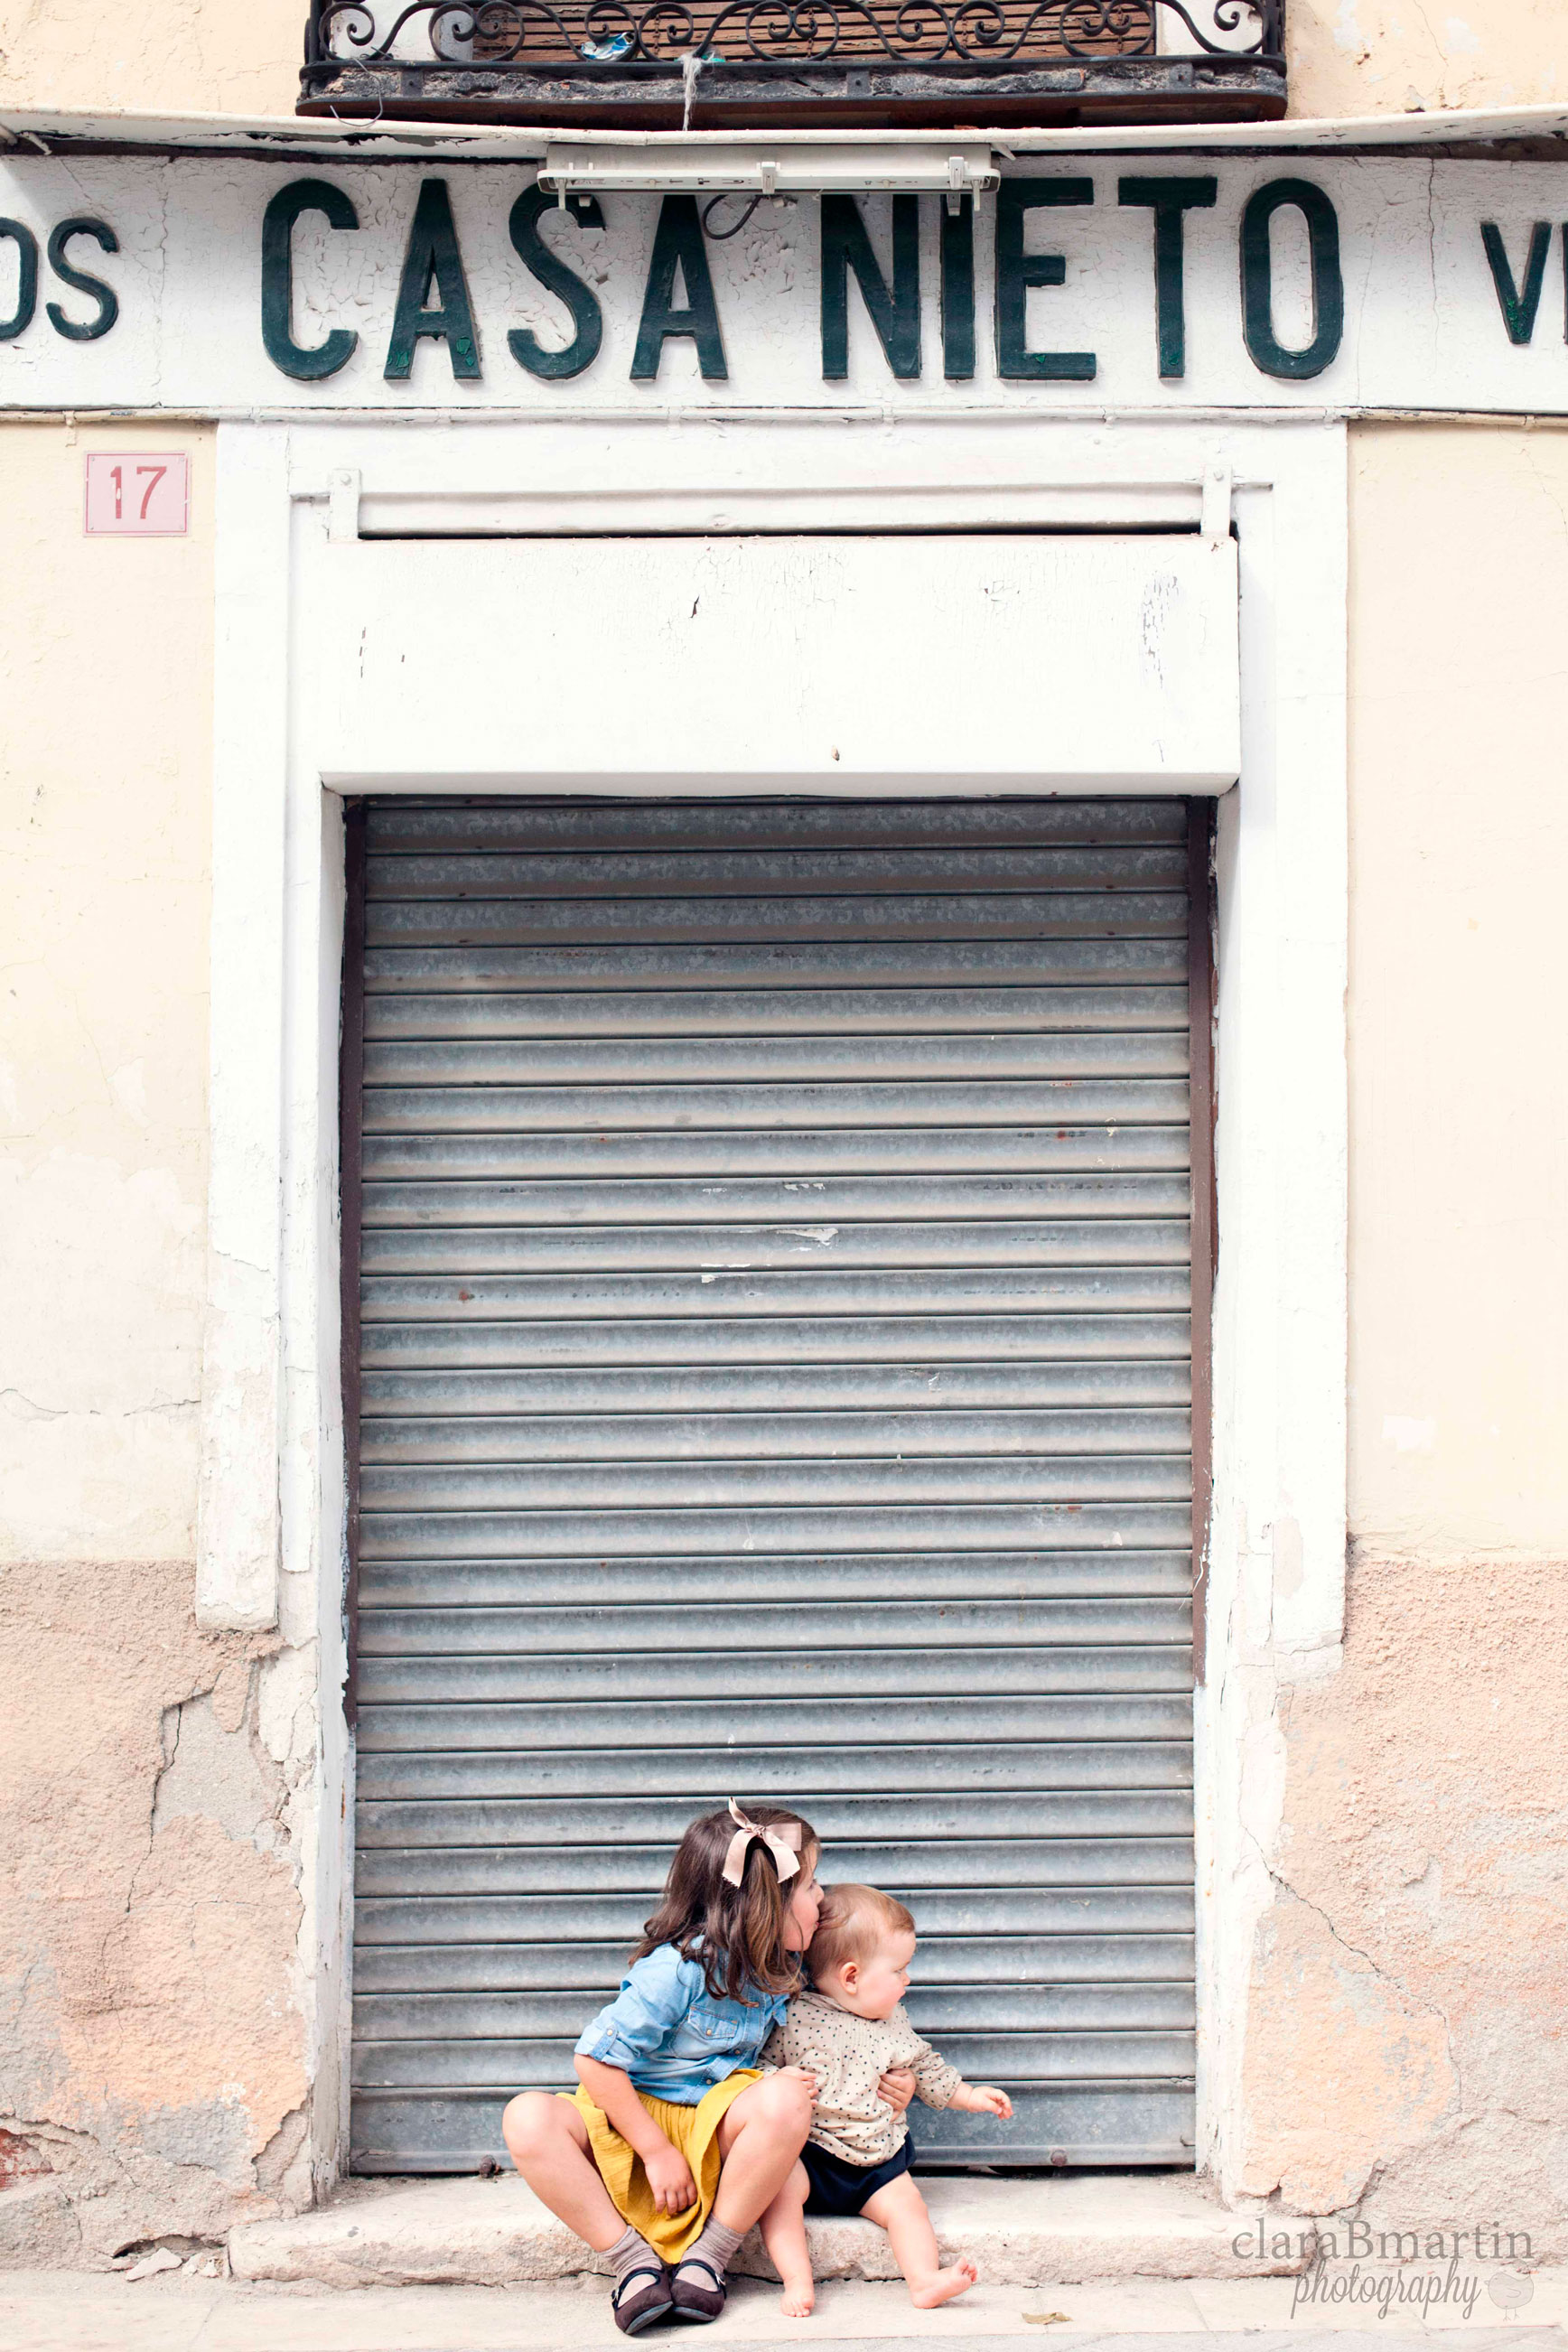 Otoño_claraBmartin10